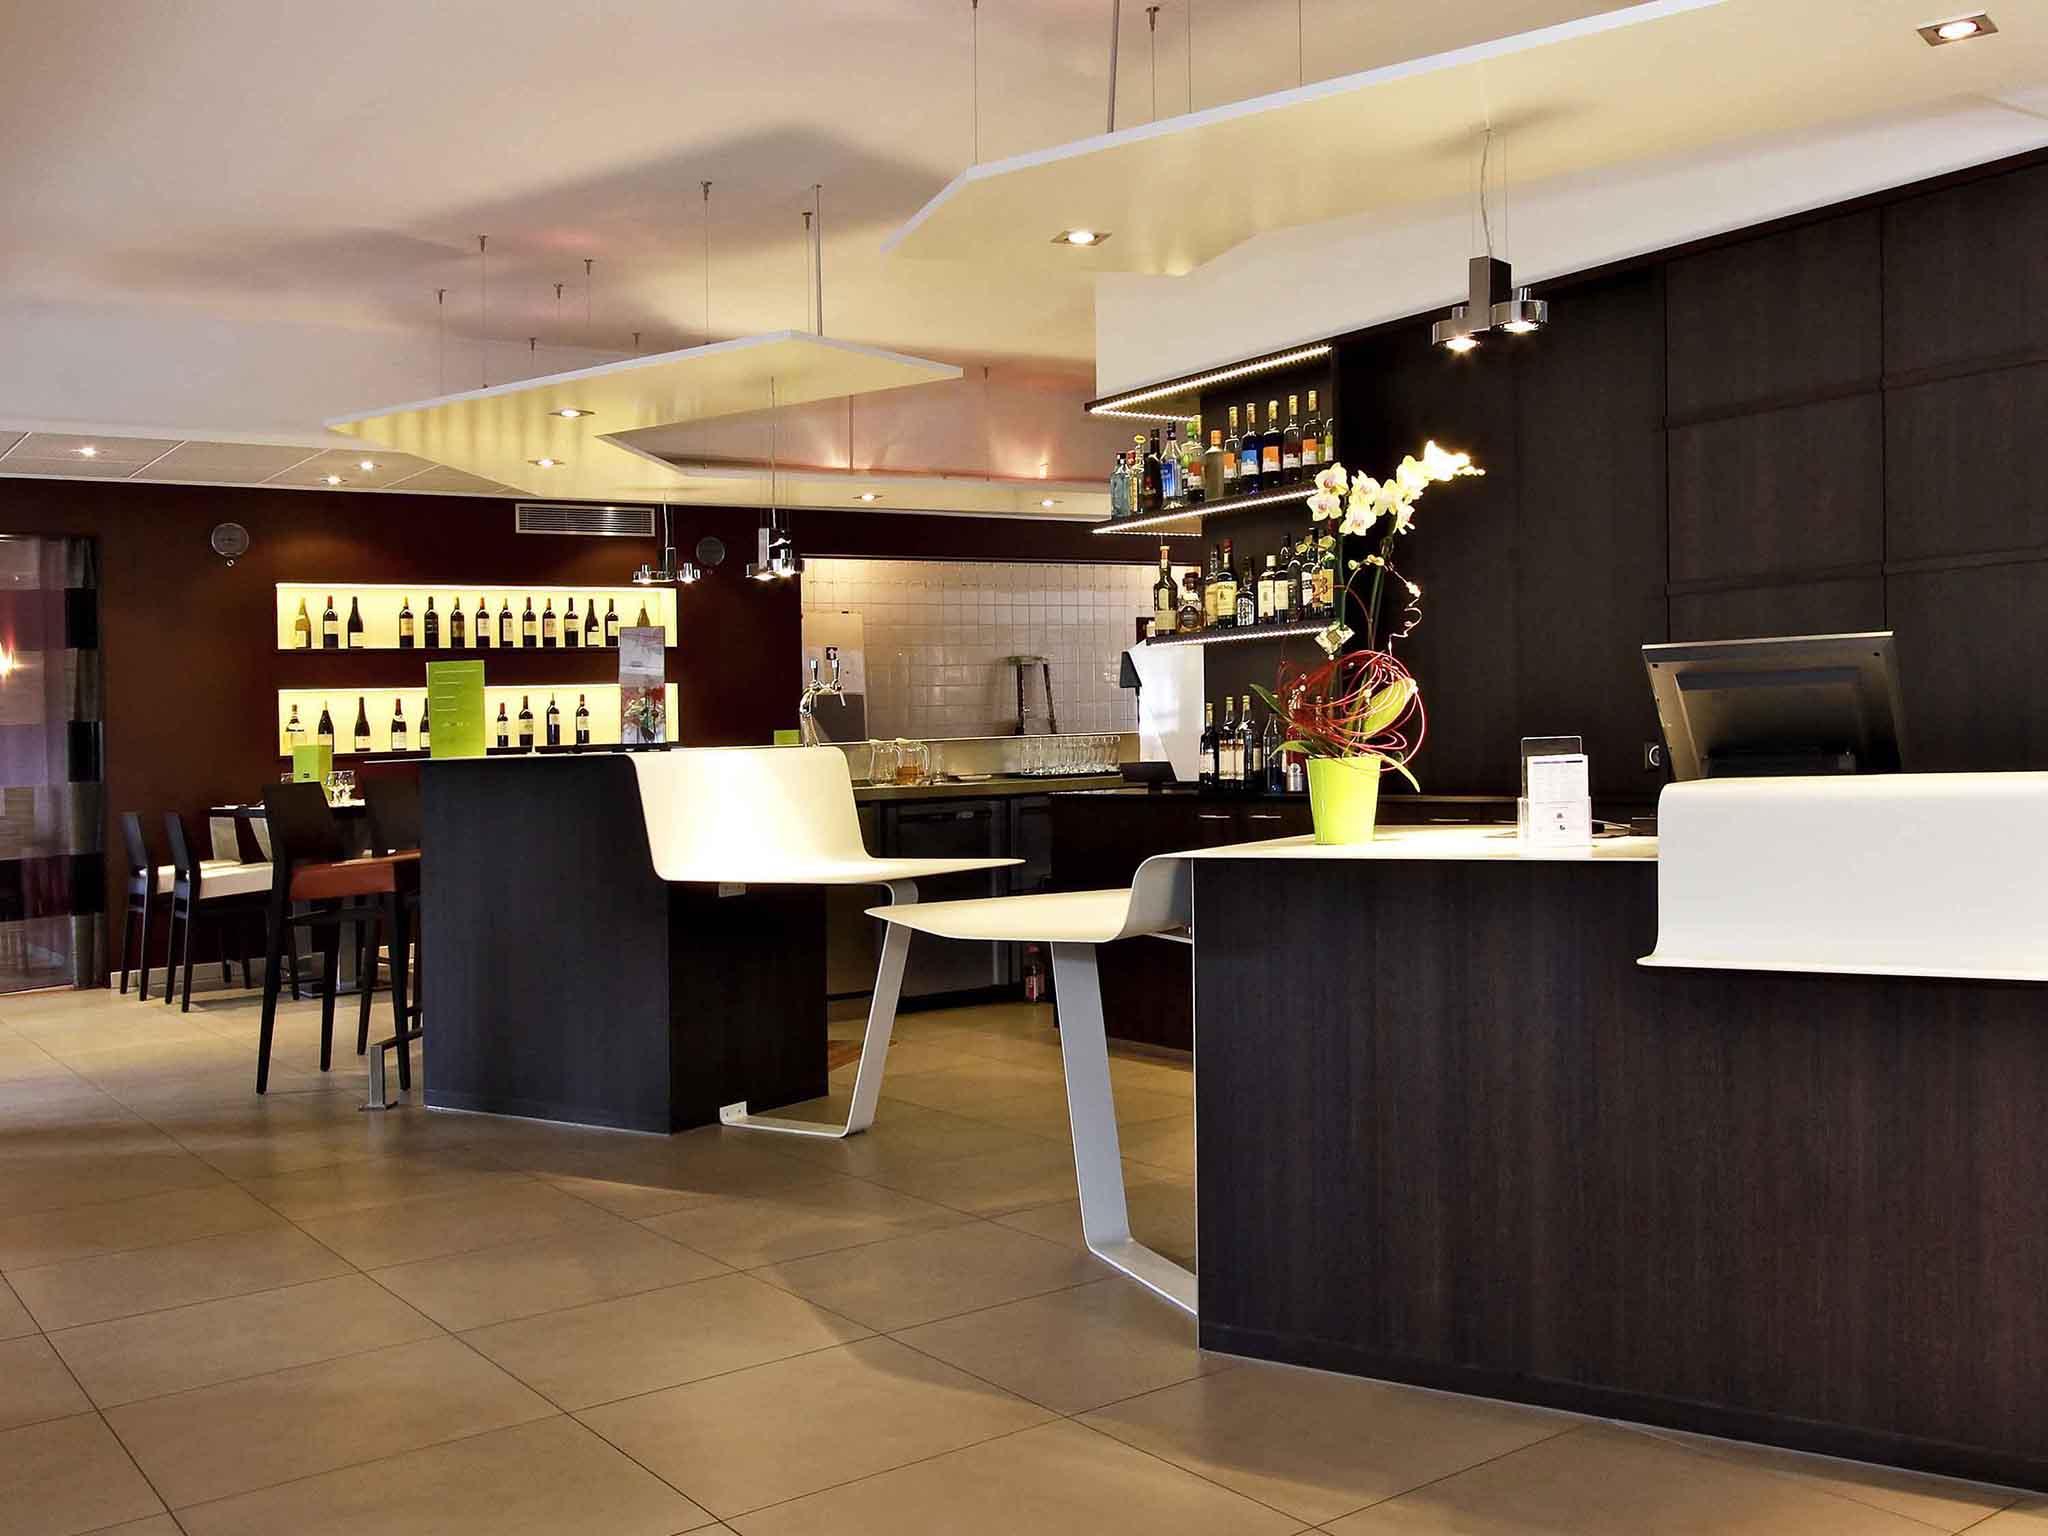 Отель — Hôtel Mercure Luxeuil-les-Bains Hexagone